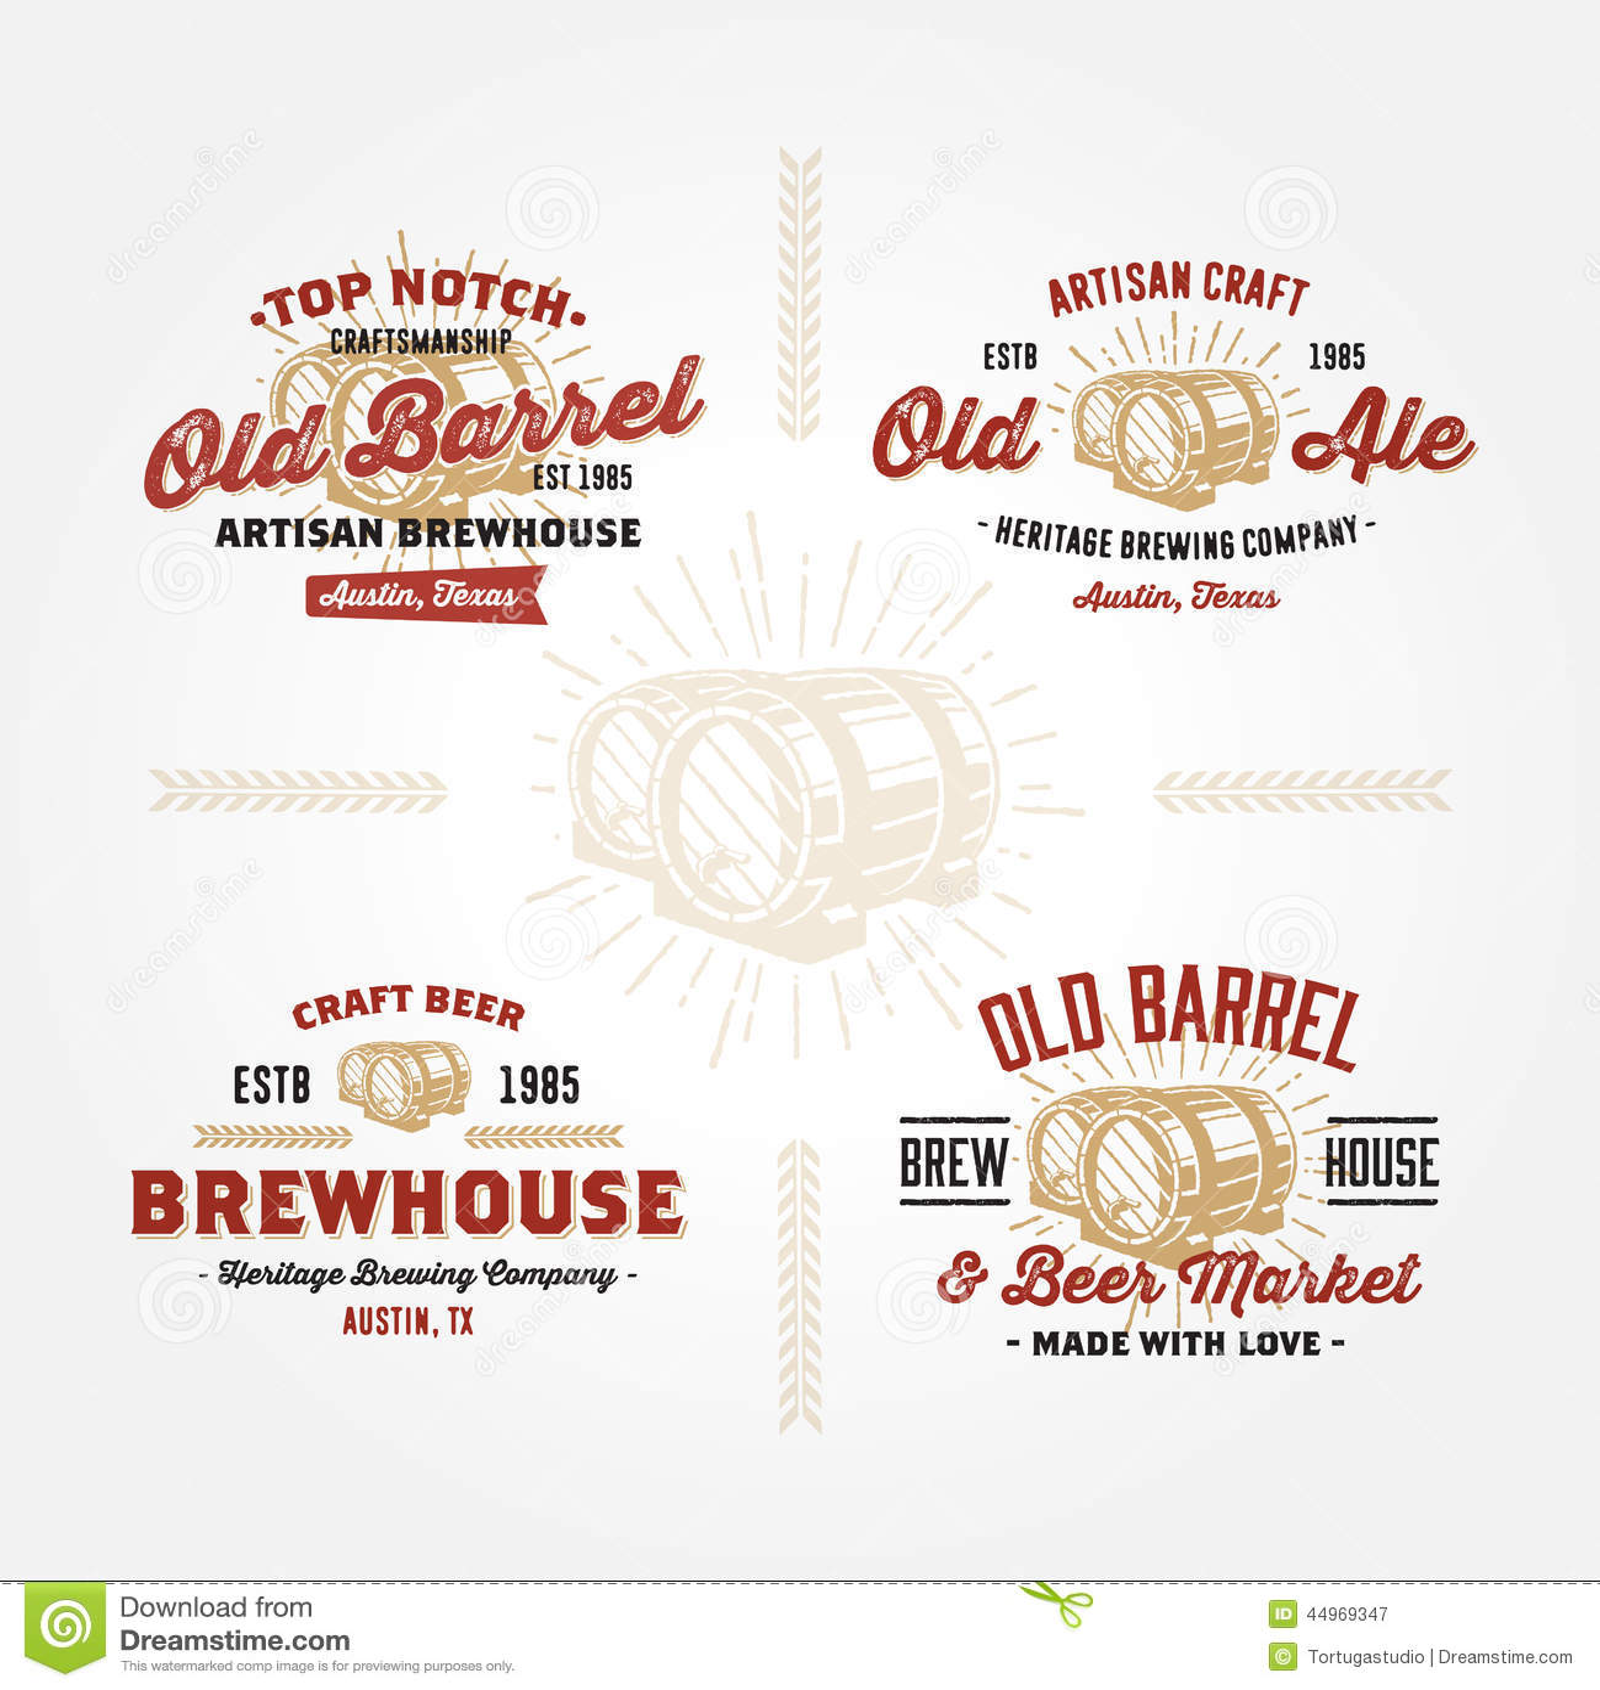 Business plan for a pub